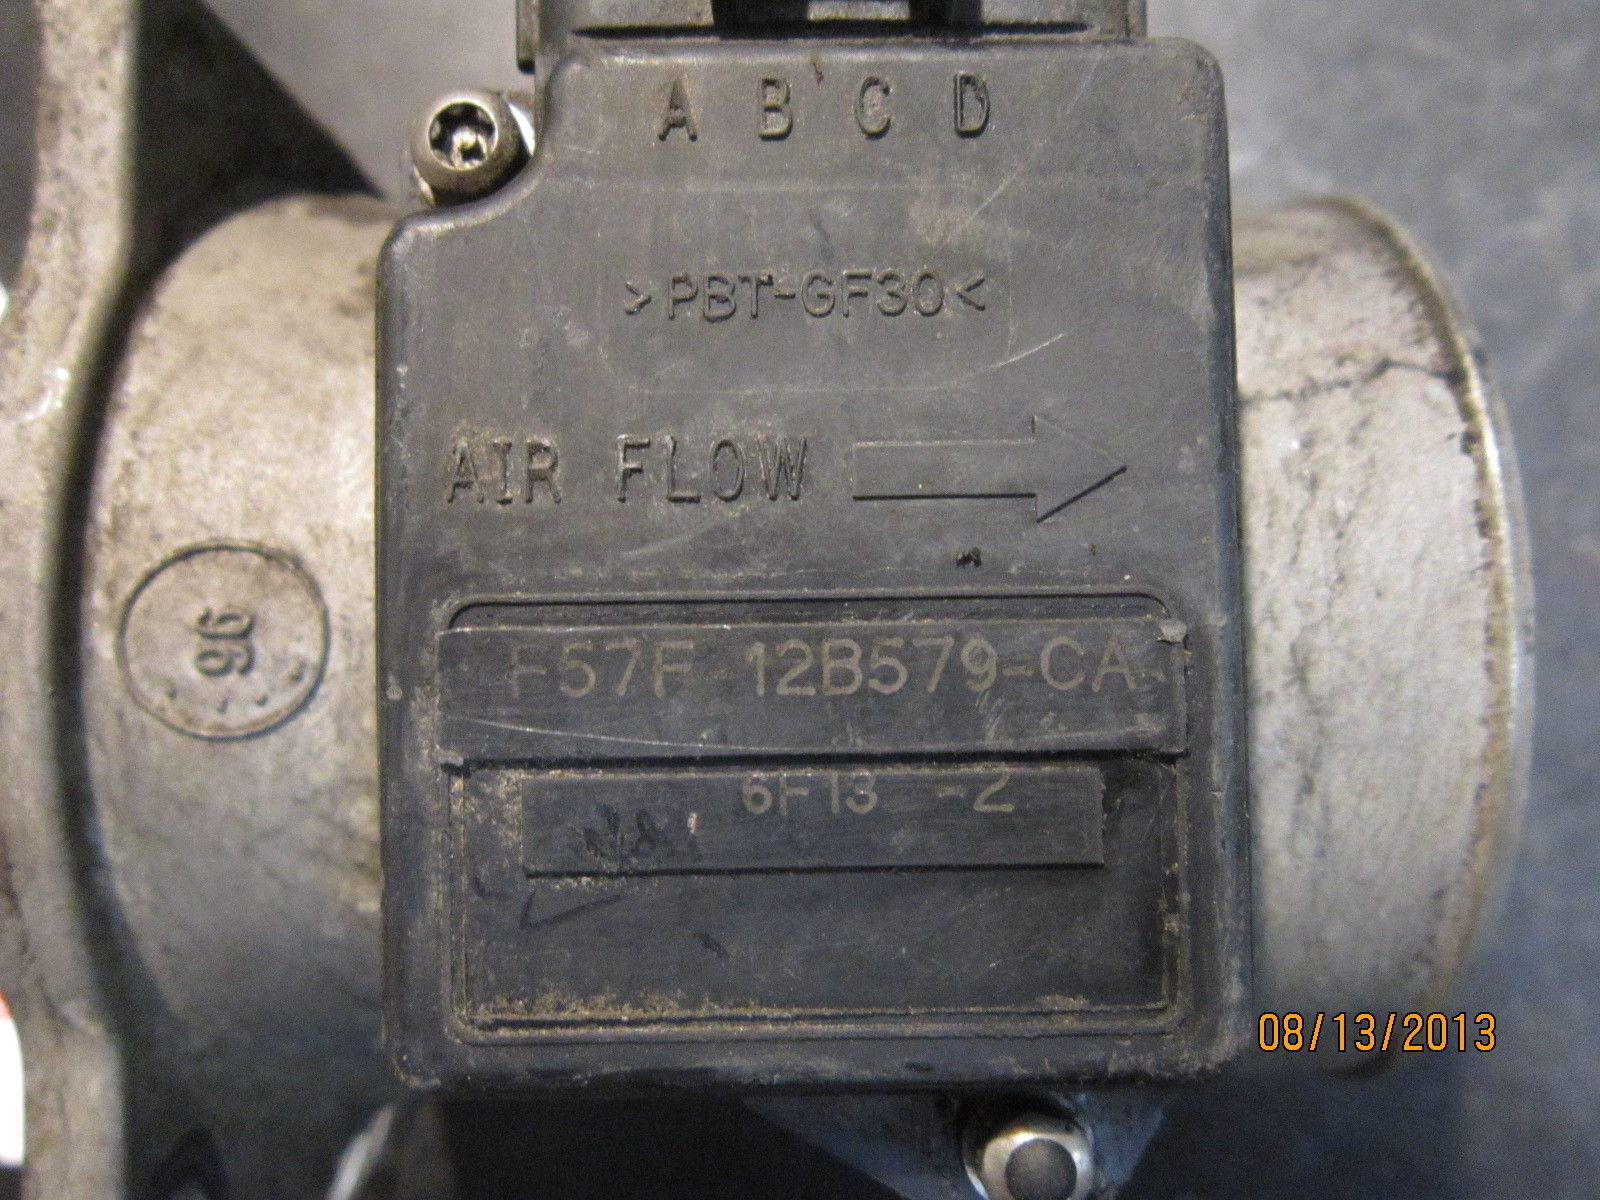 FORD,LINCOLN AIR FLOW SENSOR #F57F-12B579-CA *See item description*